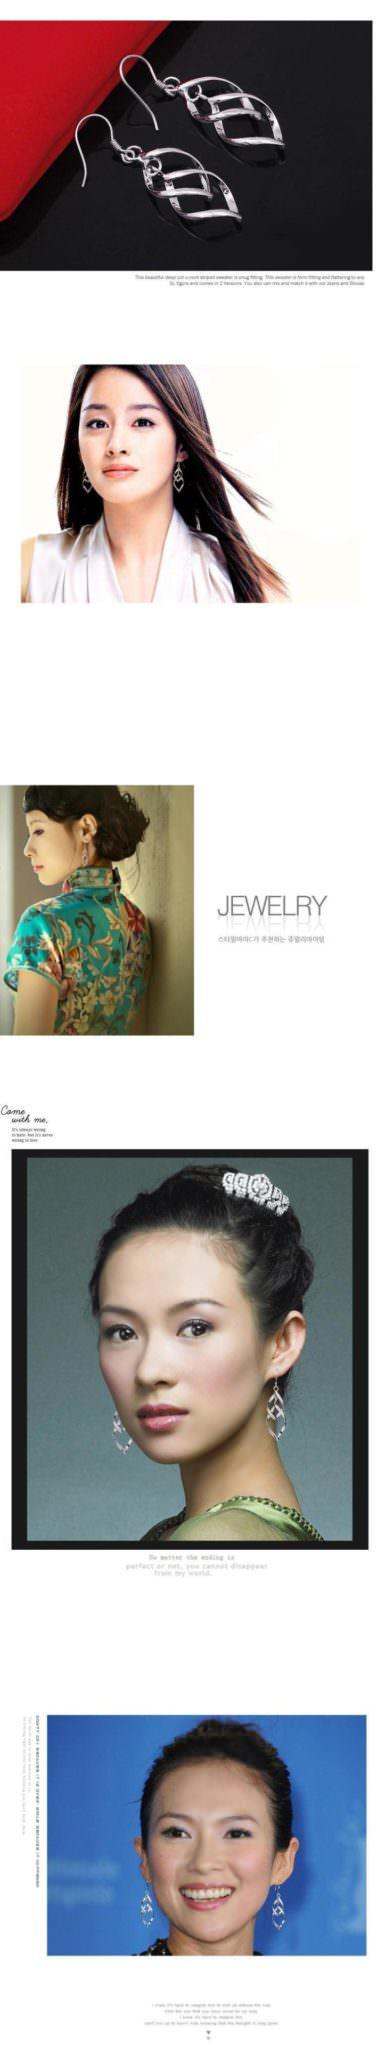 11566-87a638171922c4ae7aba7164b51c8149 Trendy Rhombus Interlaced French Wire Earring Jewelry